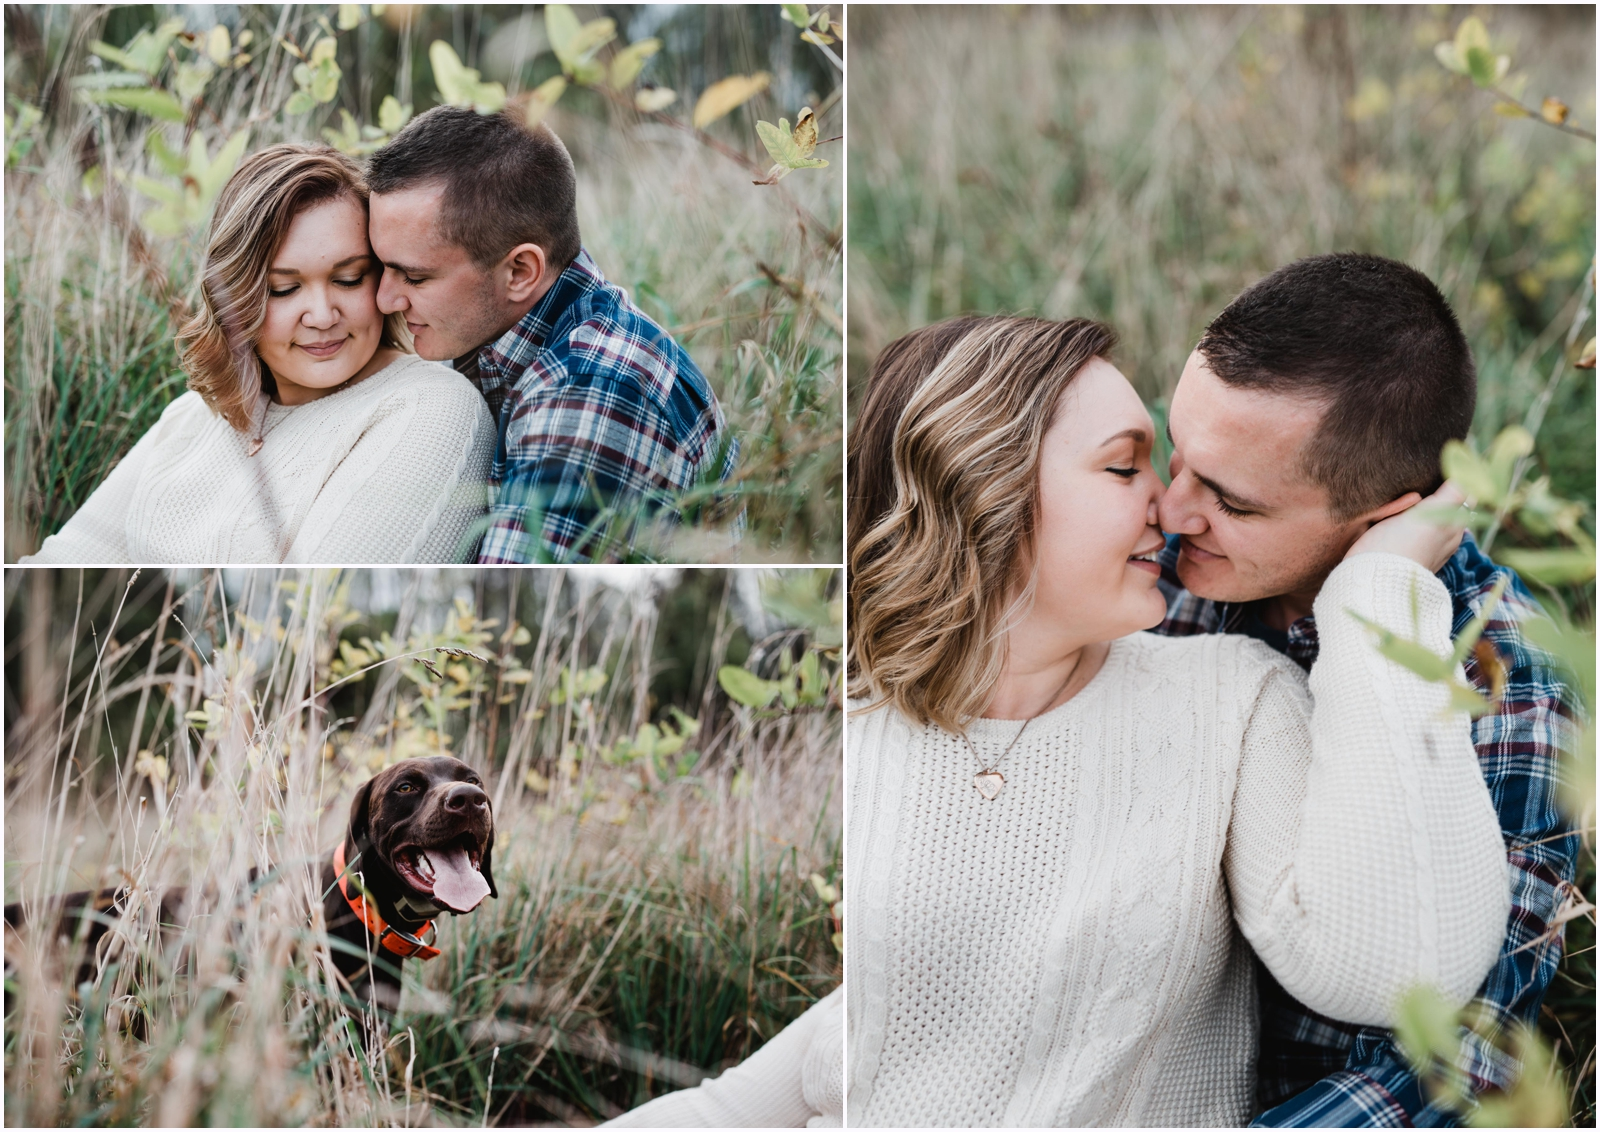 jamie_leonard_photography_engaged_fayette_belle_vernon_pa_wedding_sunset_dogs.jpg